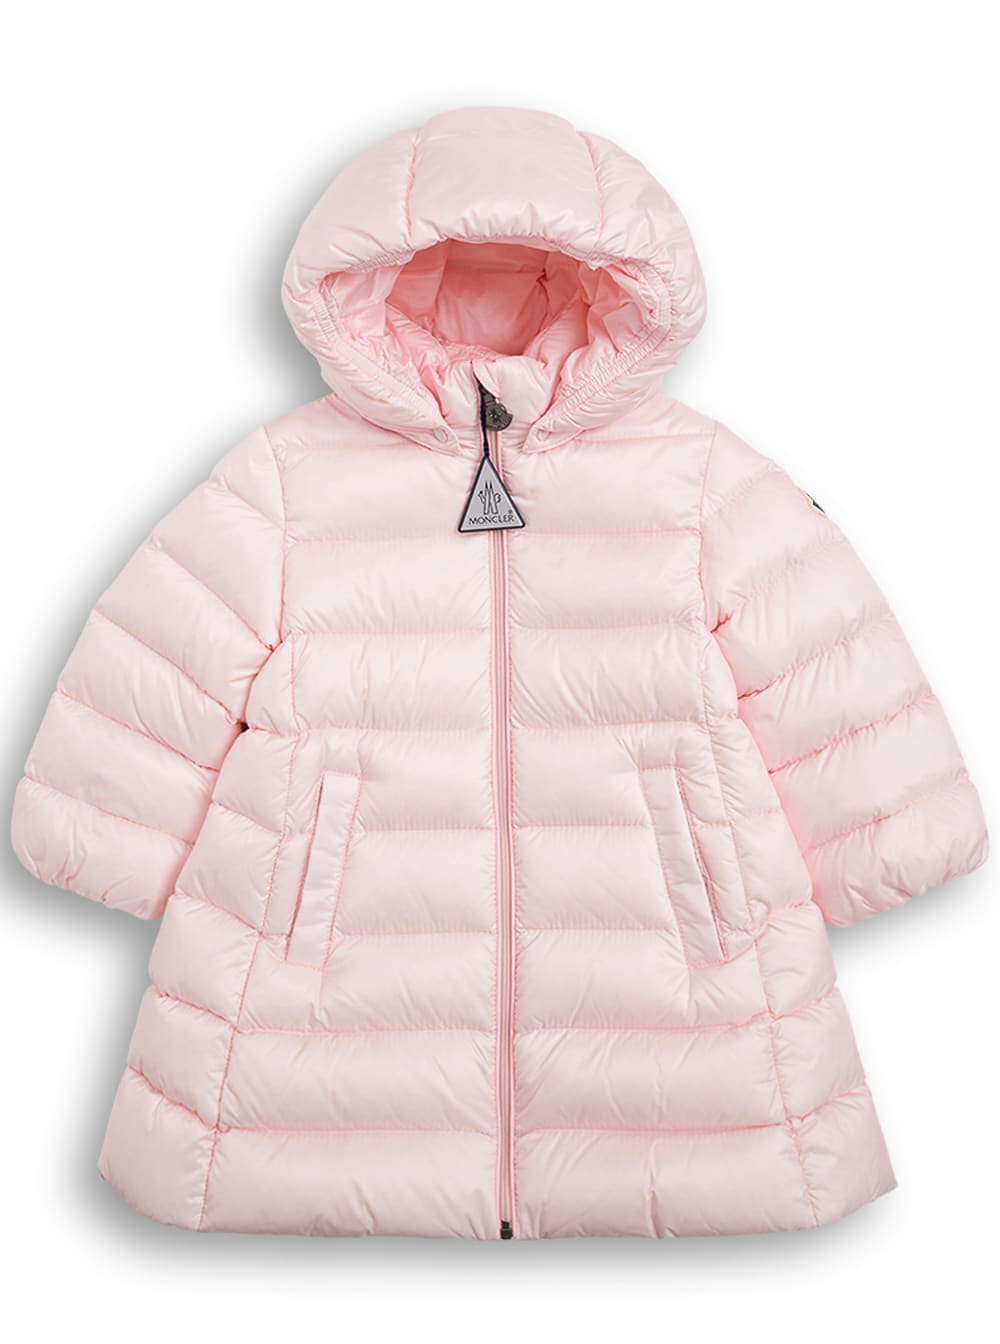 Moncler Majeure Long Down Jacket In Pink Nylon